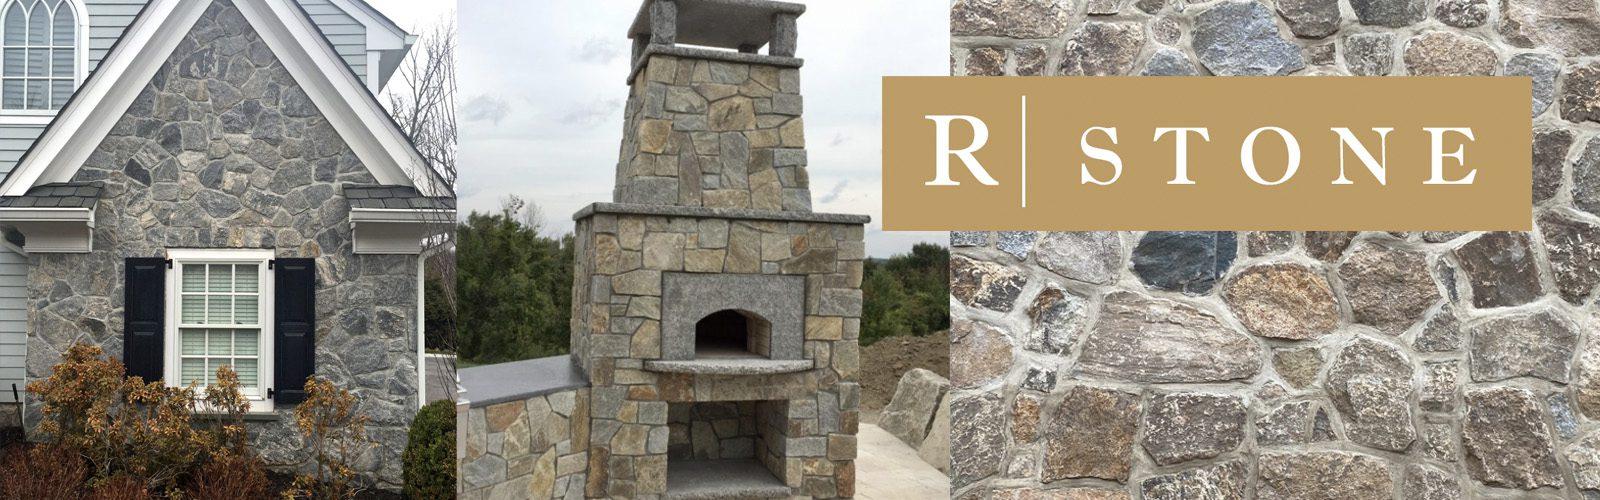 R-Stone-Thin-Veneer-Stone-Dealer-NJ